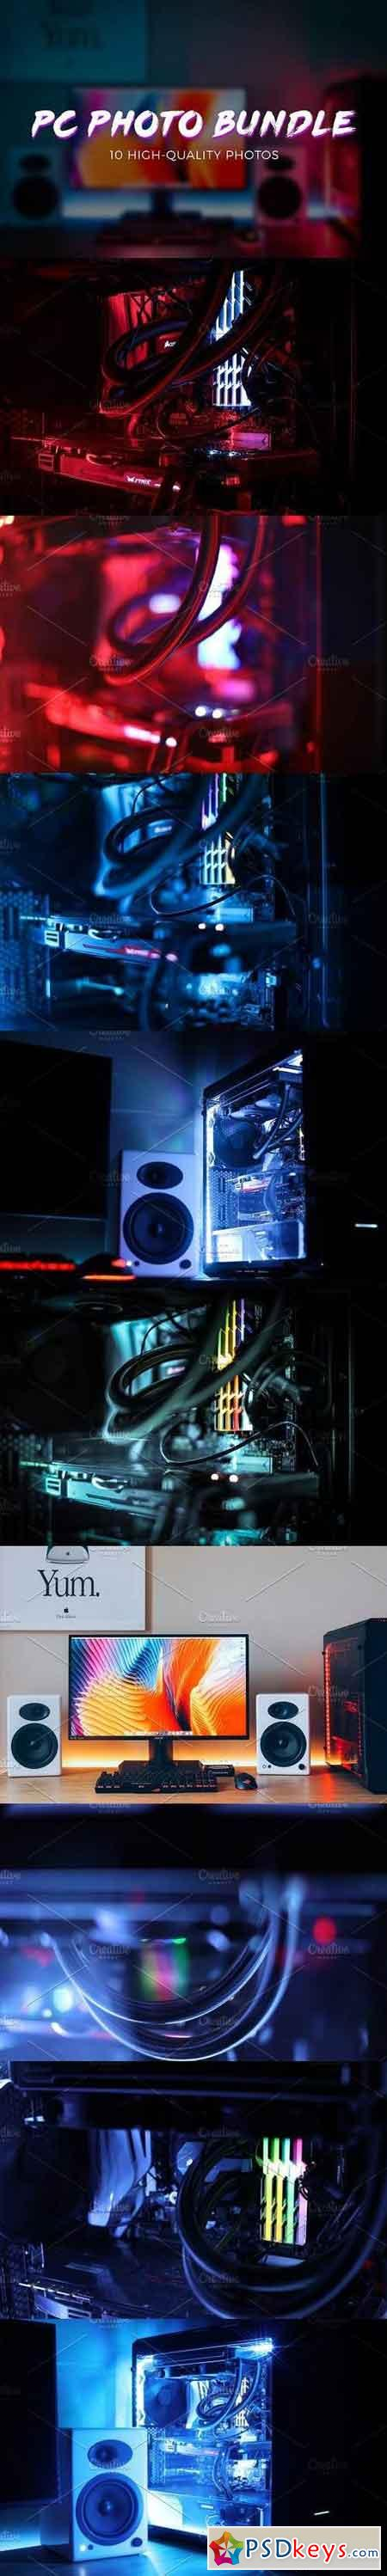 PC Photo Bundle 1347231